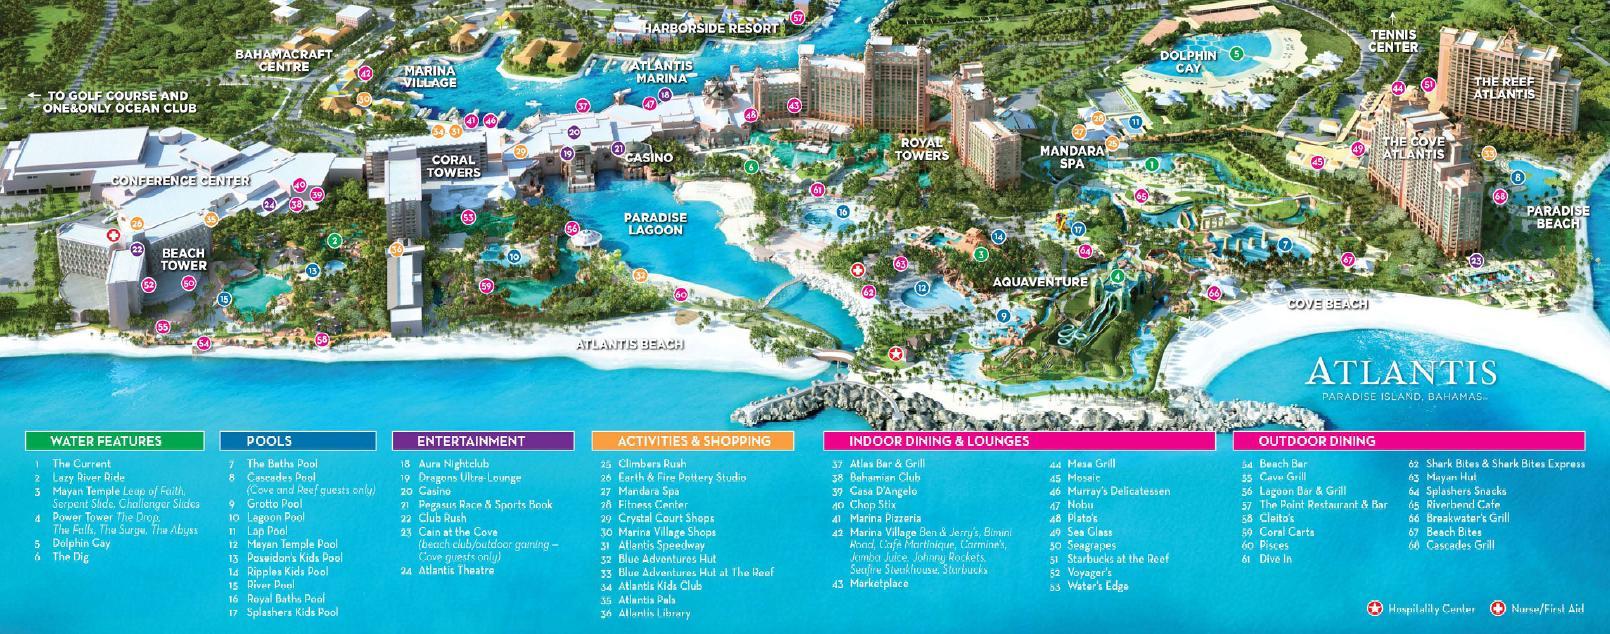 Map of Hotel.jpg